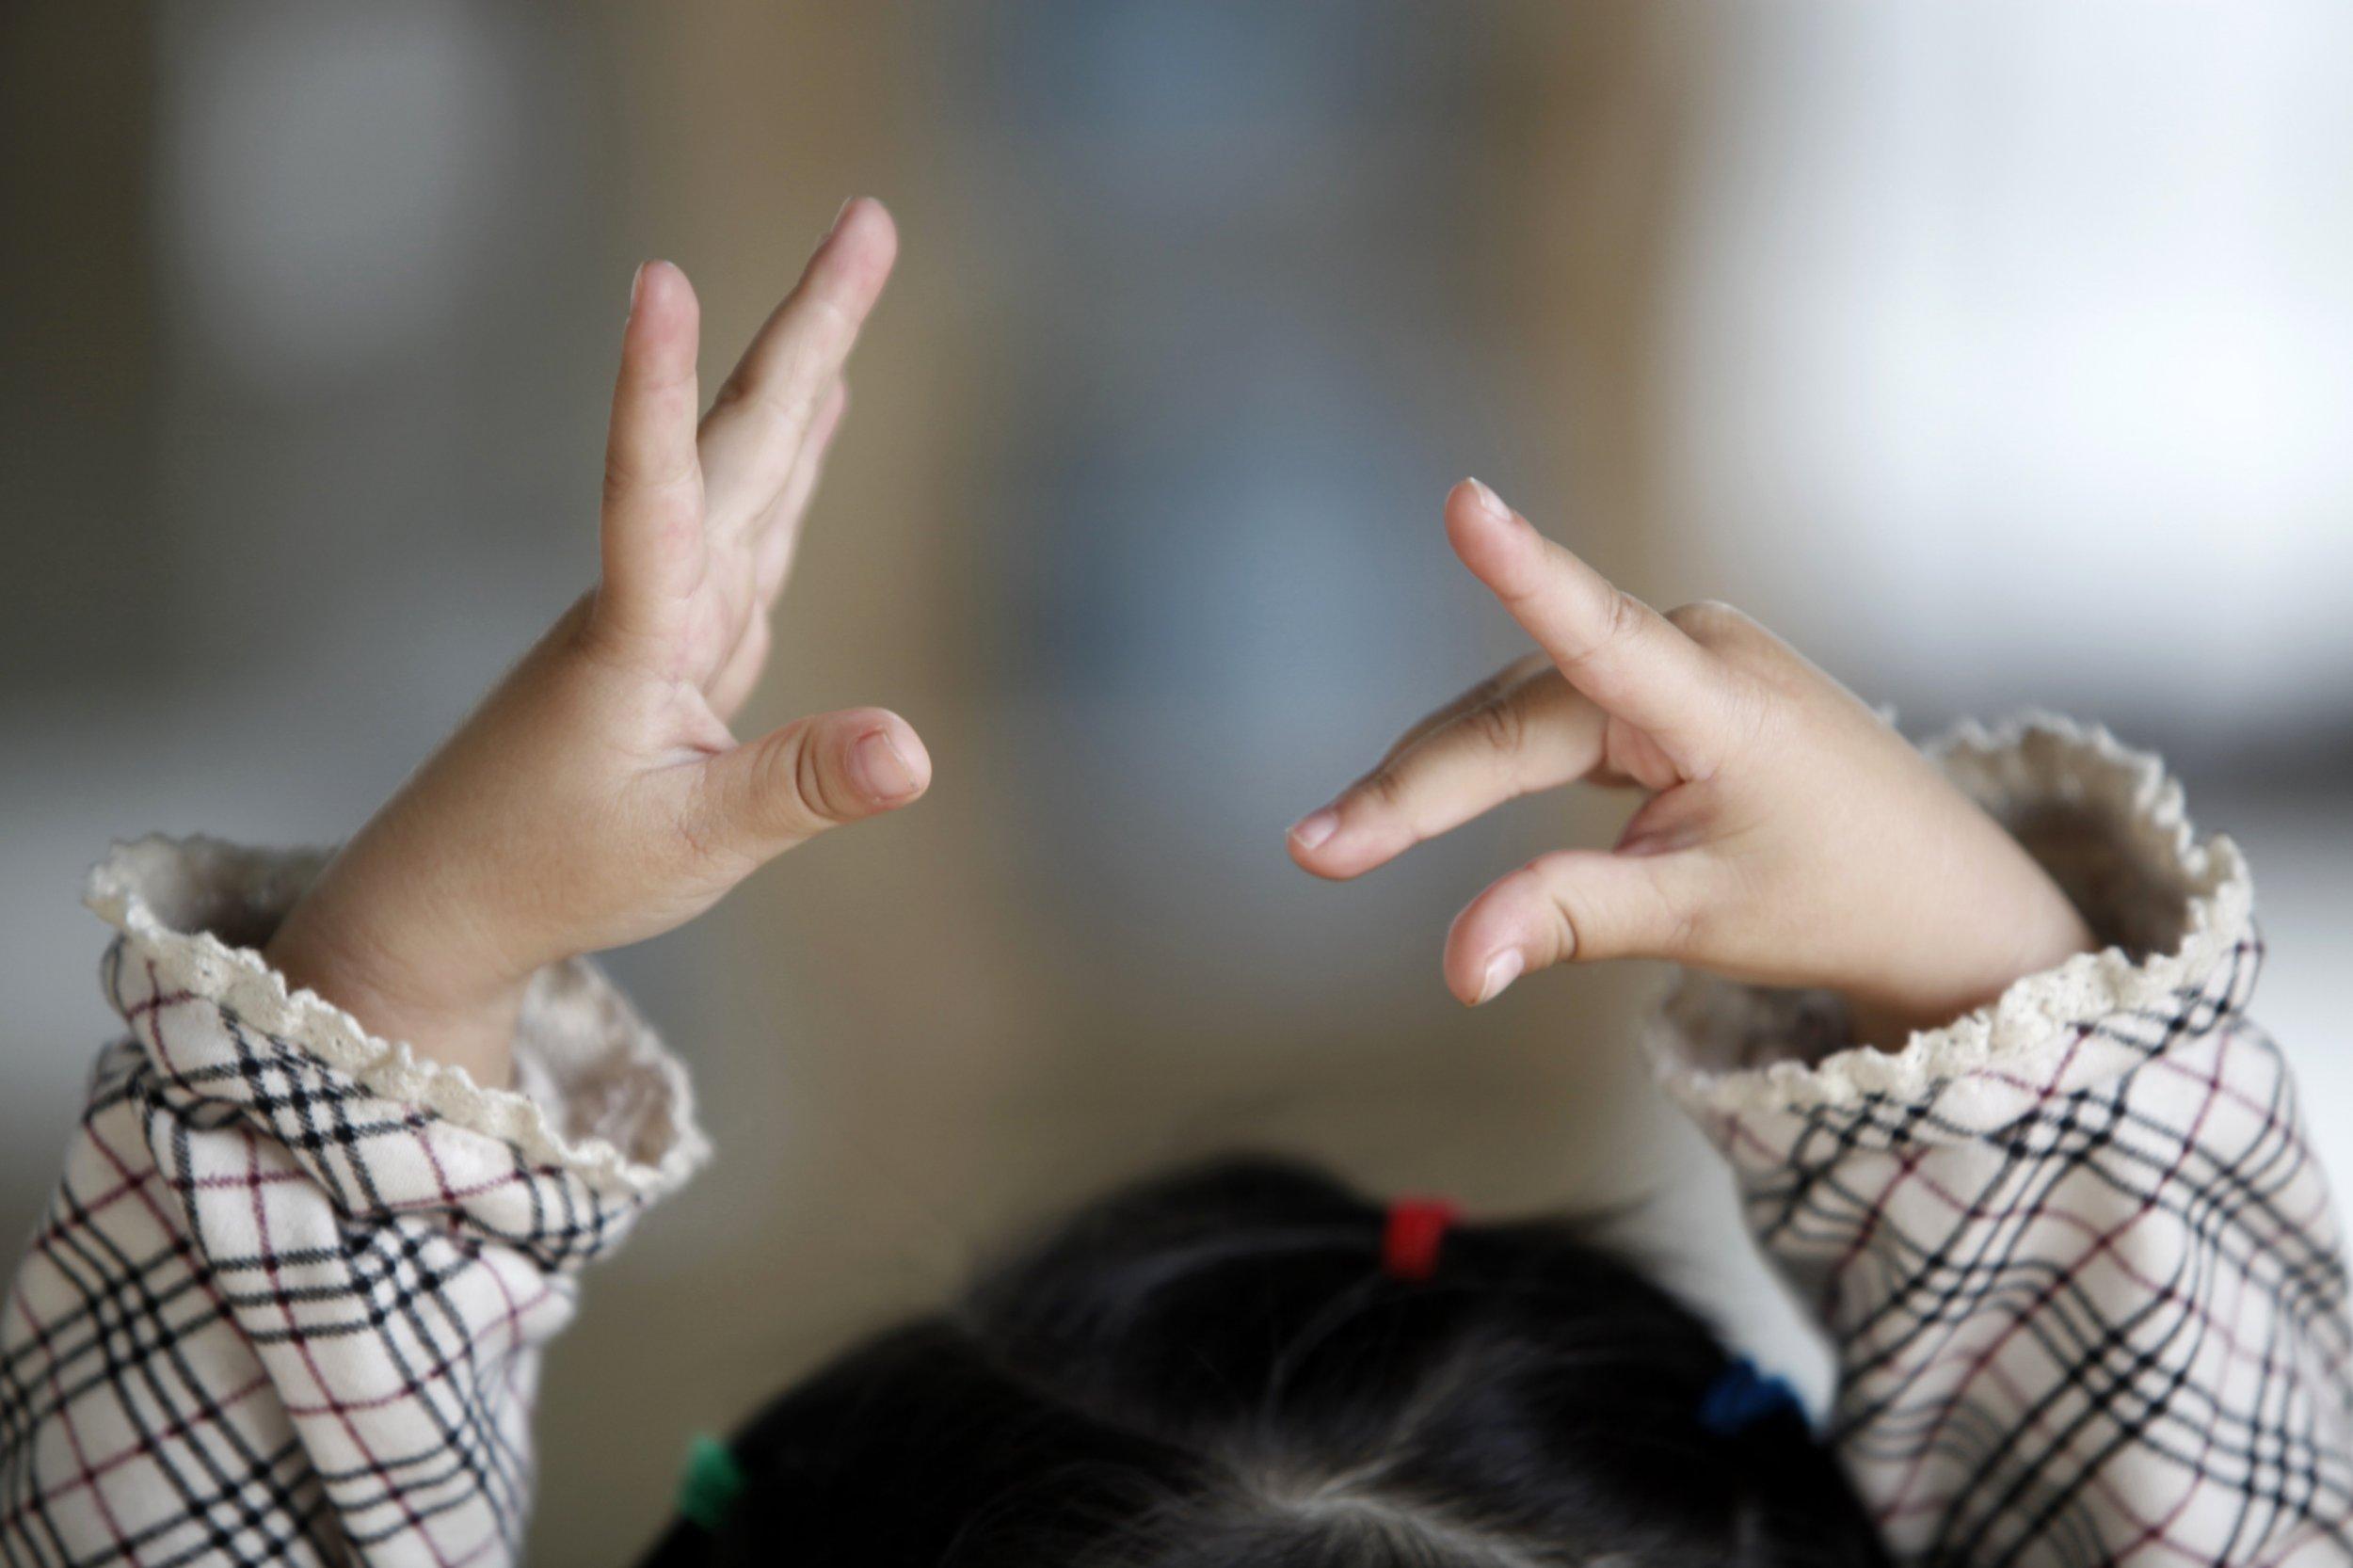 Little dancer's hands